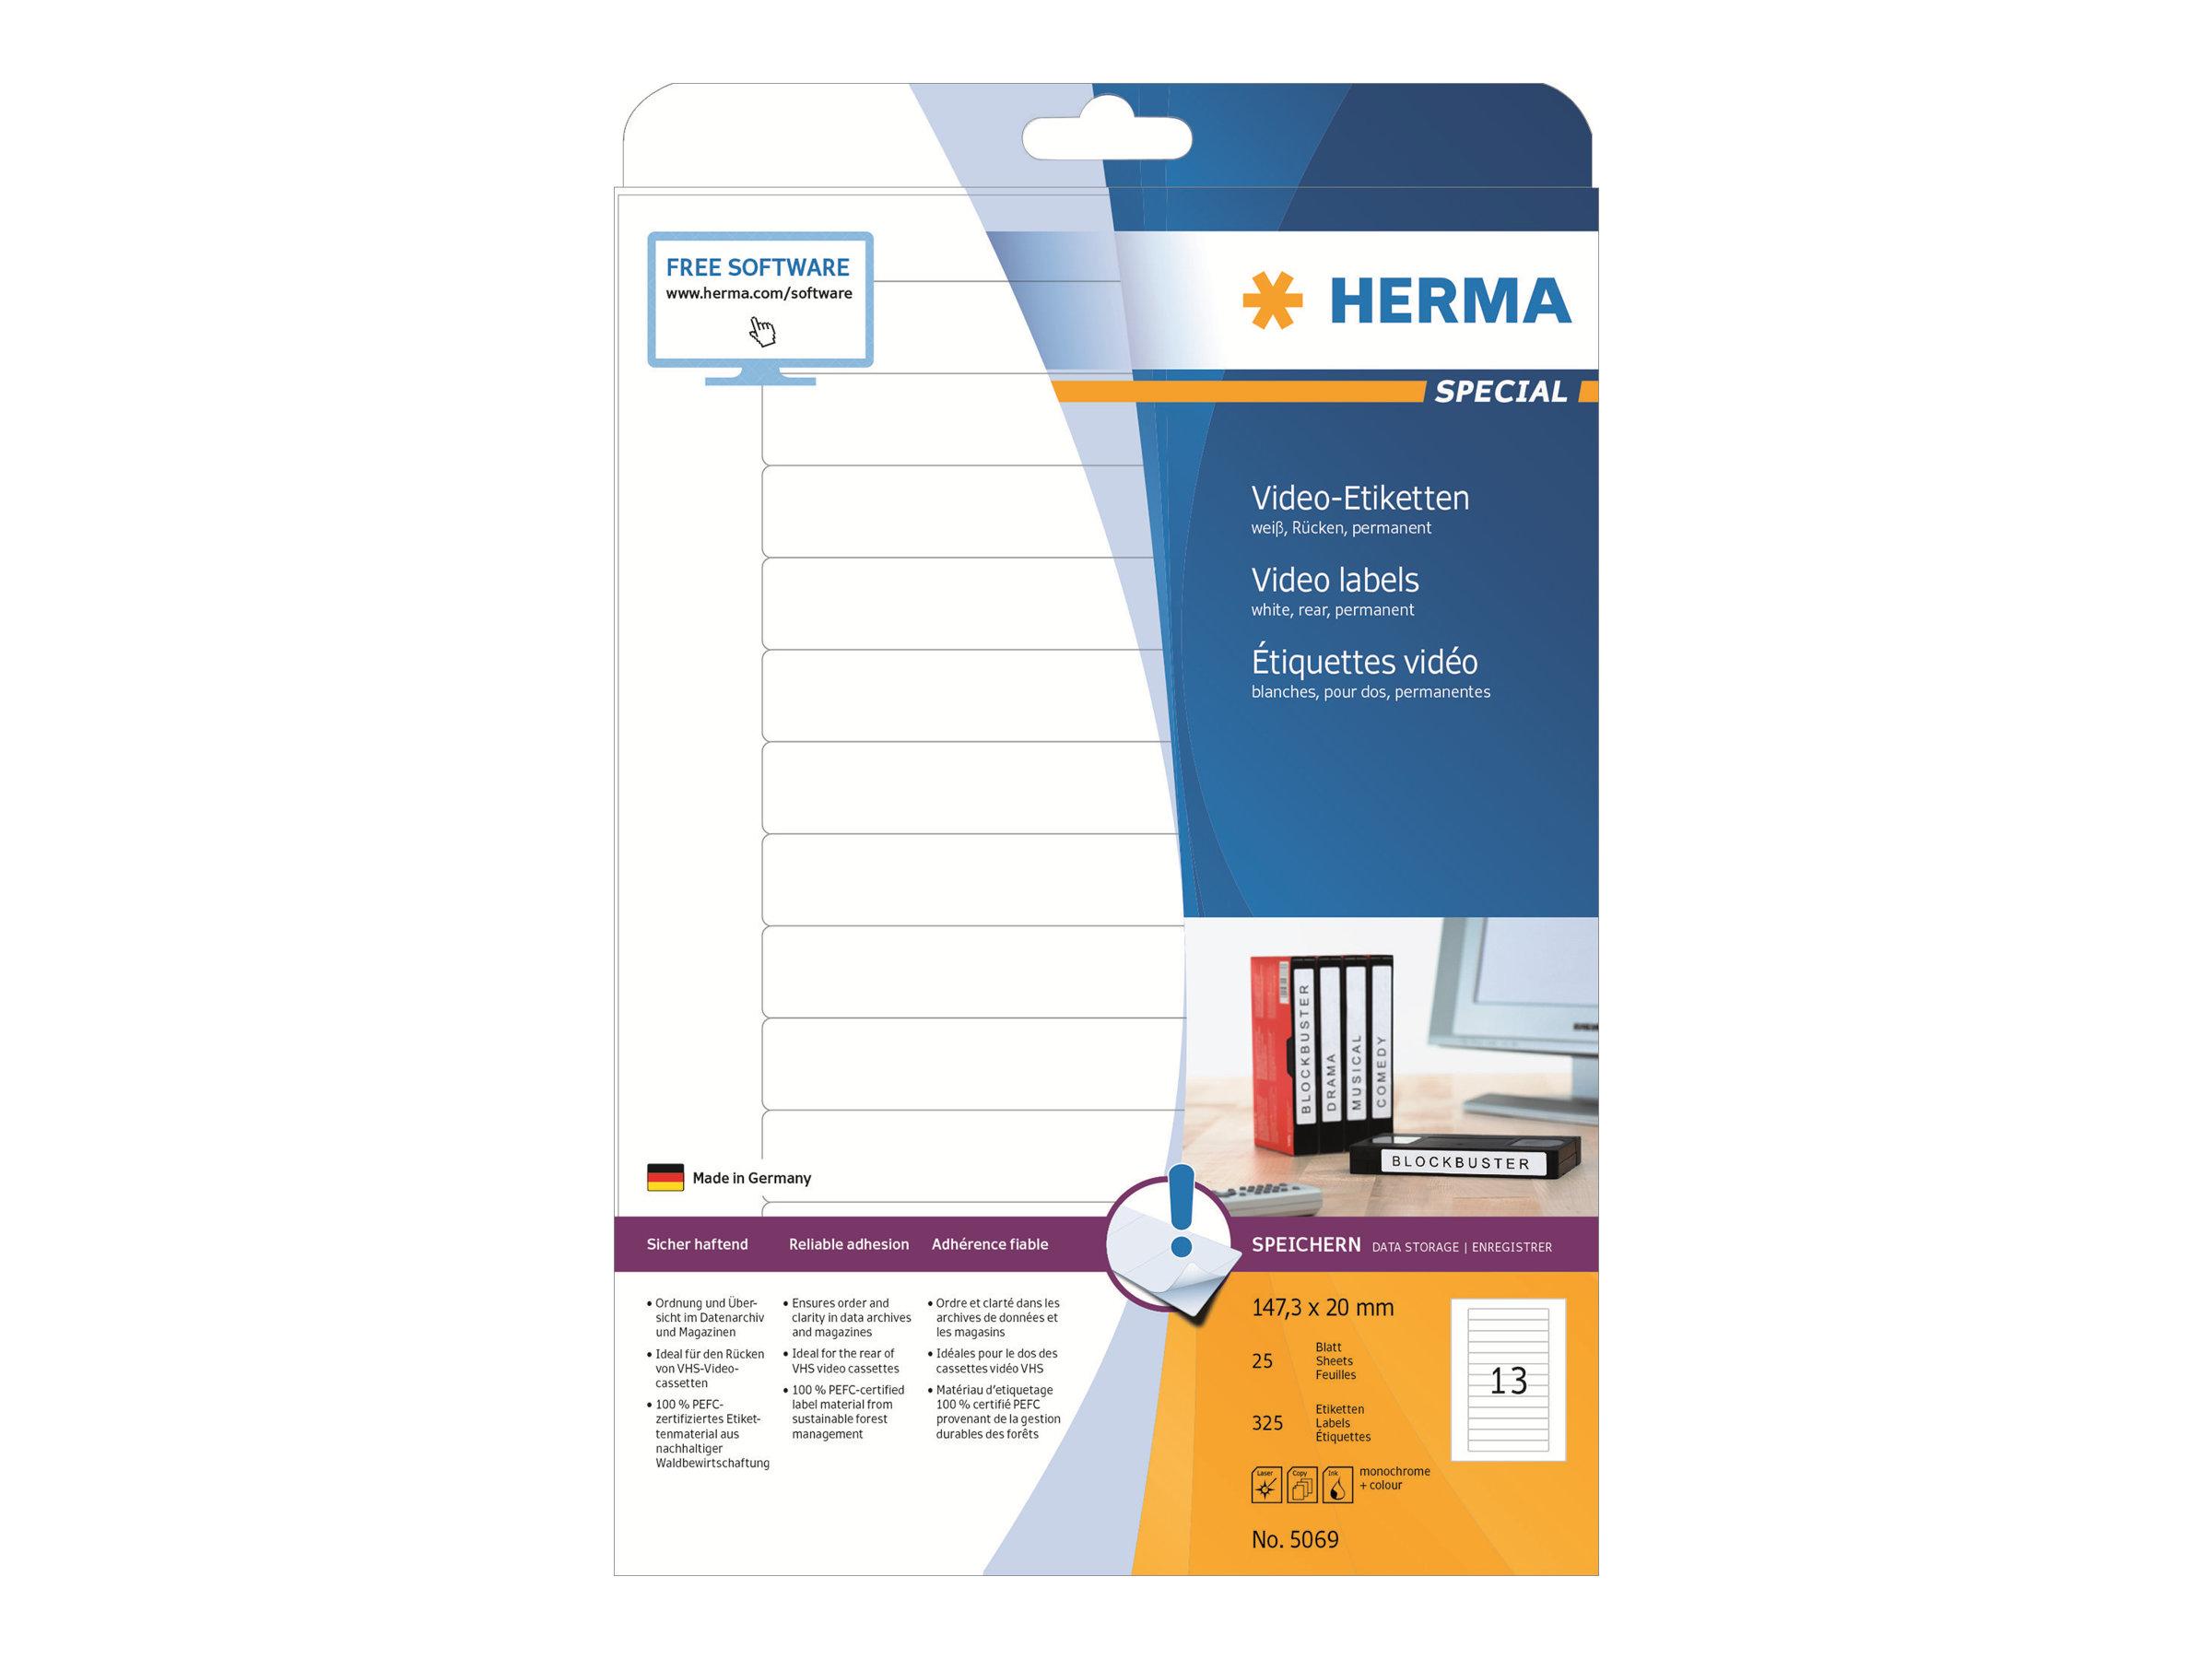 HERMA Special - Papier - matt - permanent selbstklebend - weiß - 147,3 x 20 mm 325 Etikett(en) (25 Bogen x 13)